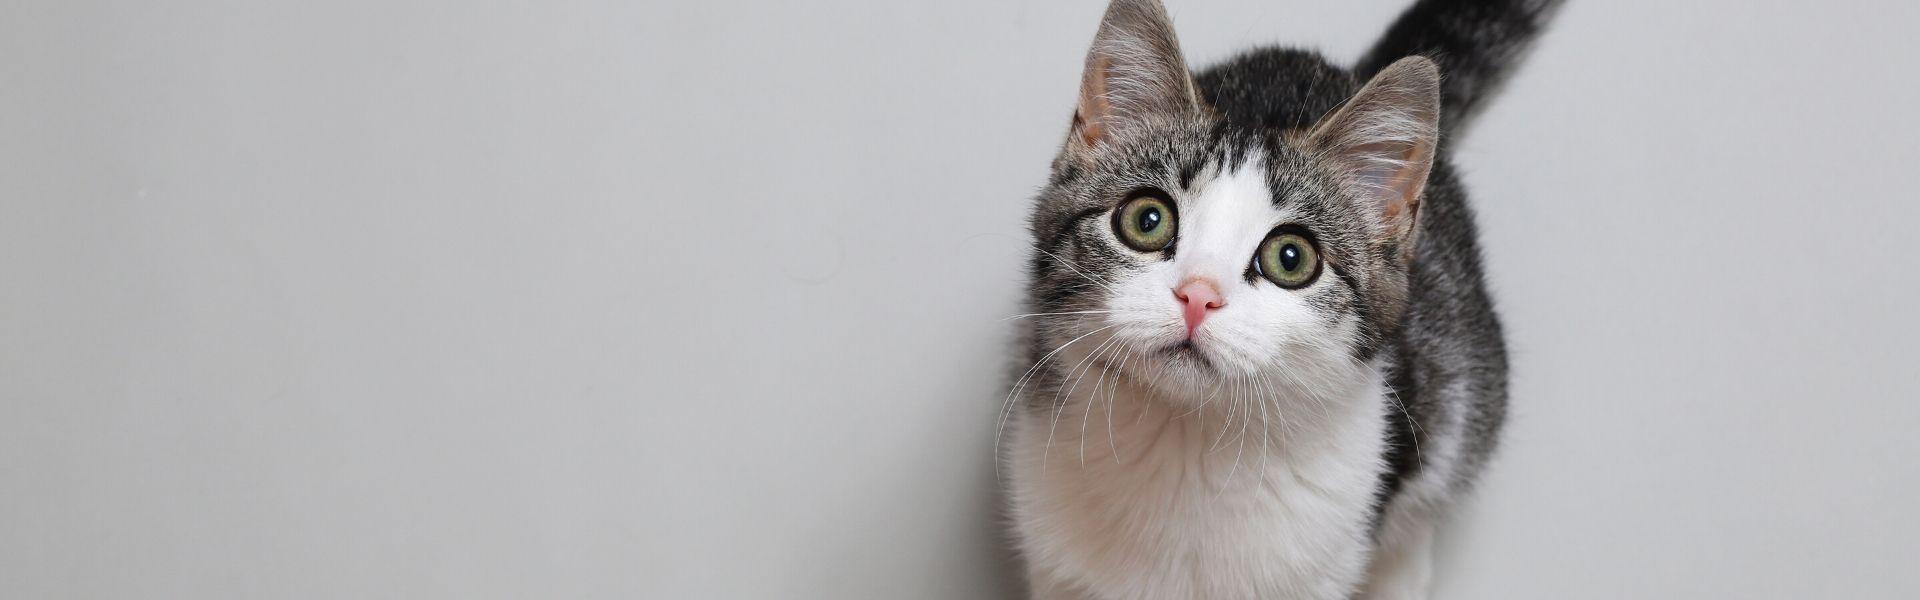 feline-circulatory-shock-podcast